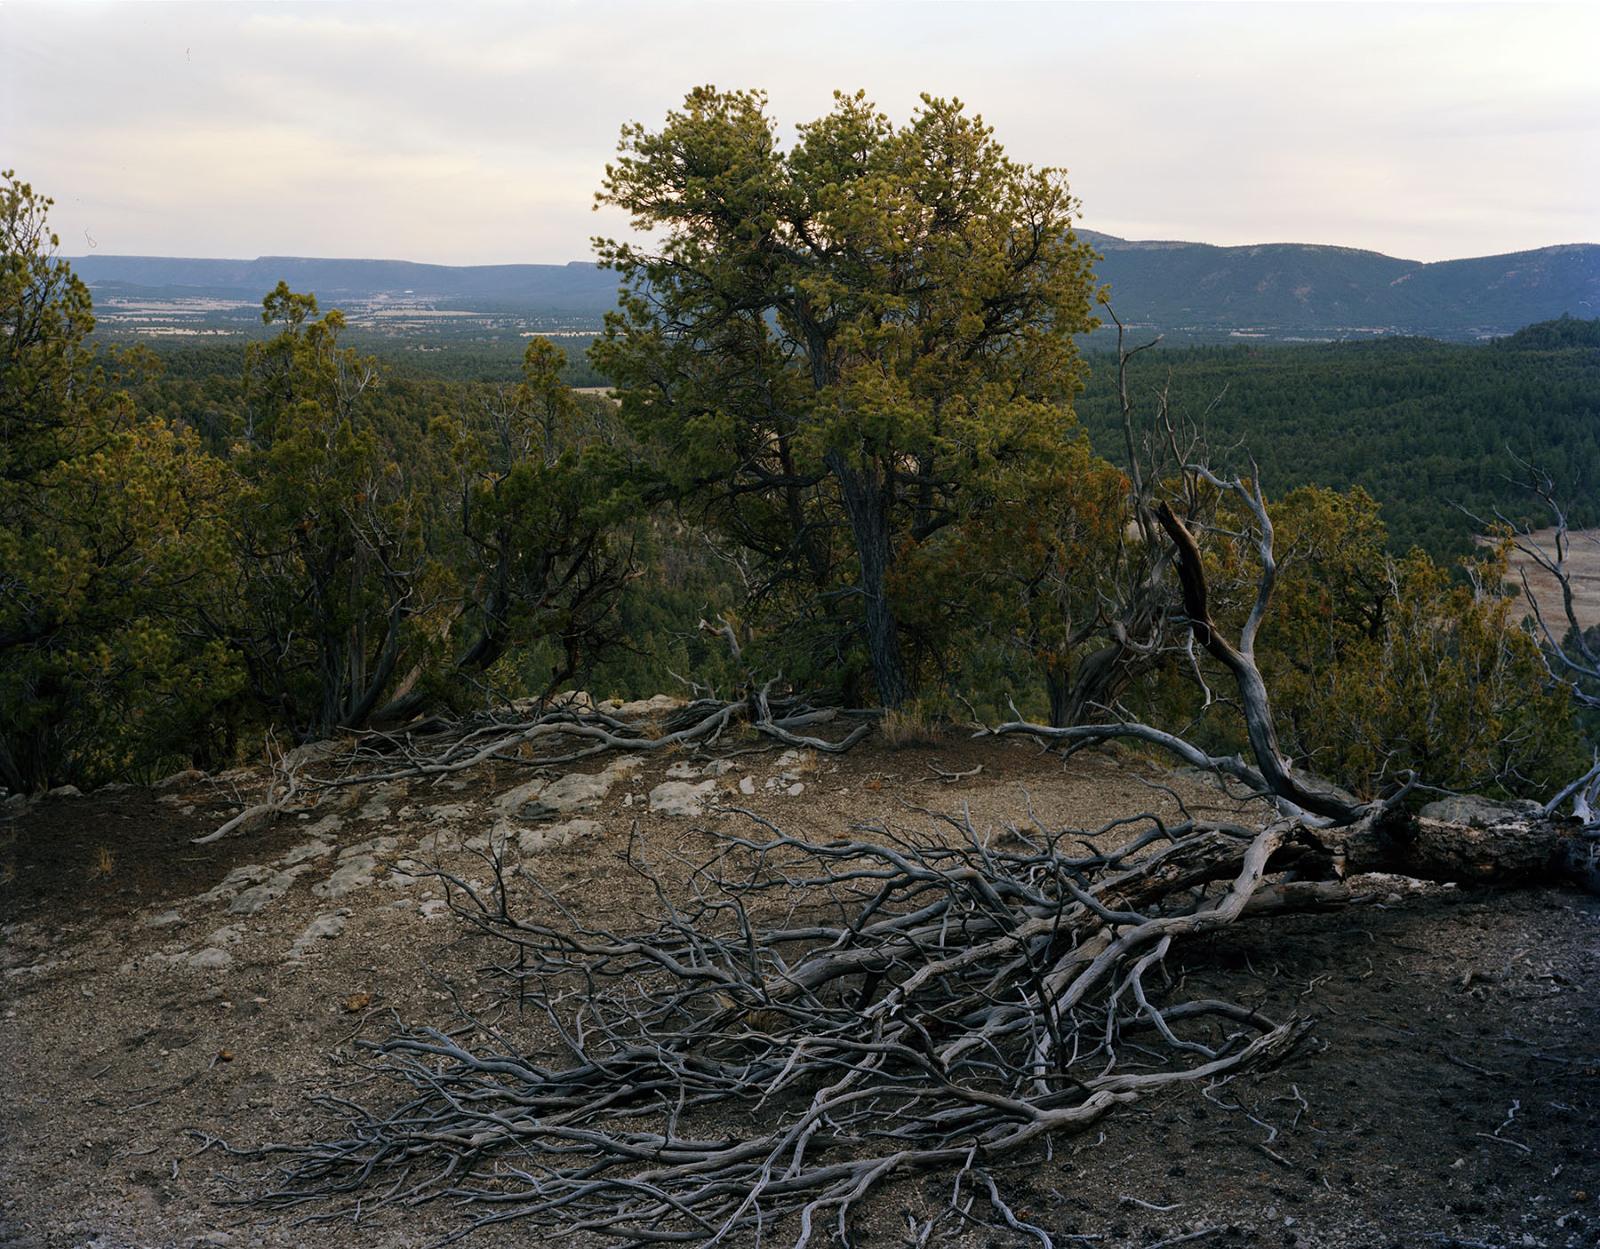 Toward Pecos, New Mexico